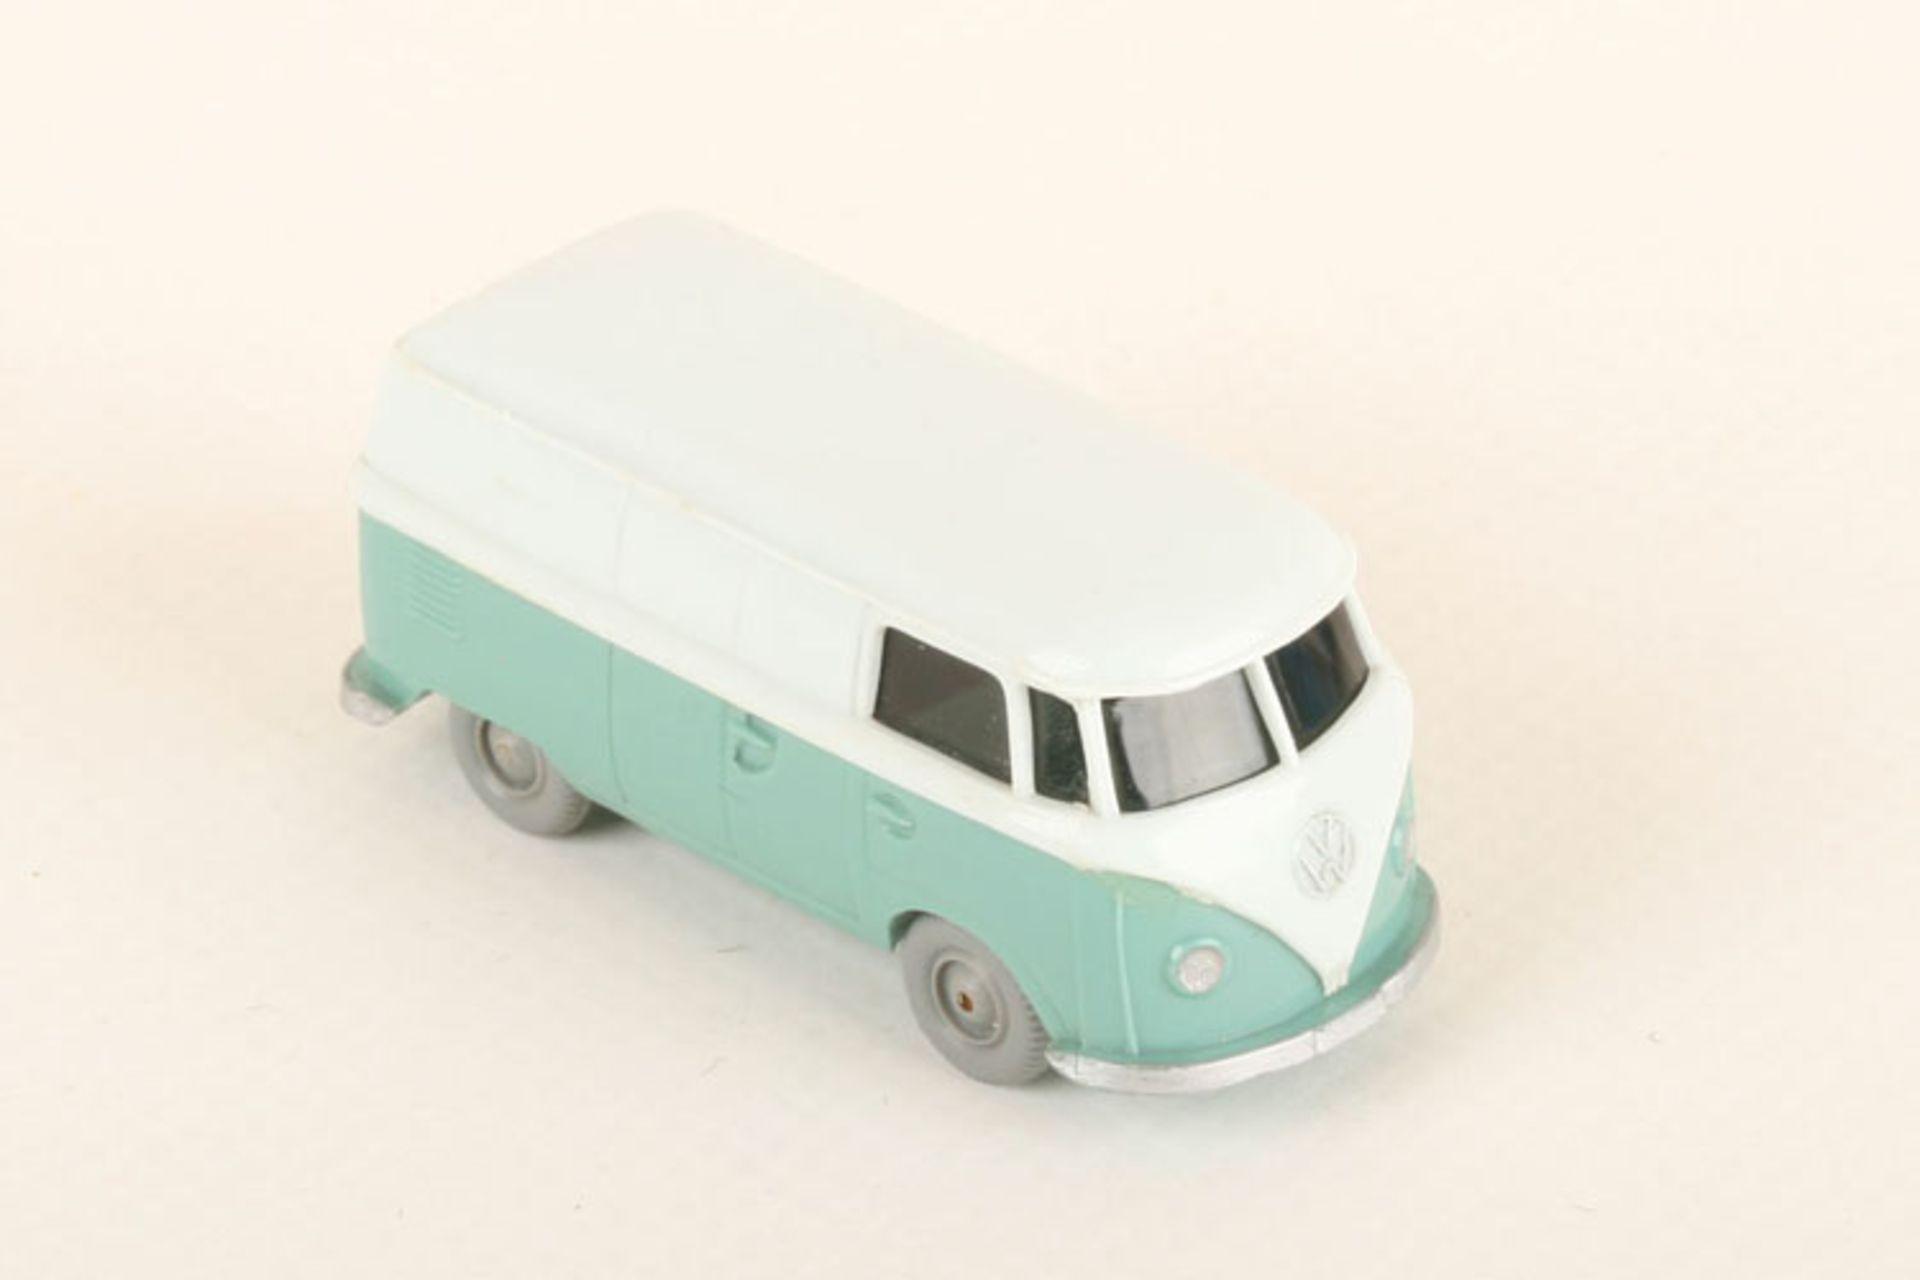 Los 1058 - Wiking VW T1 Kasten h'wässrigblau/türkis 300/9, sehr gut